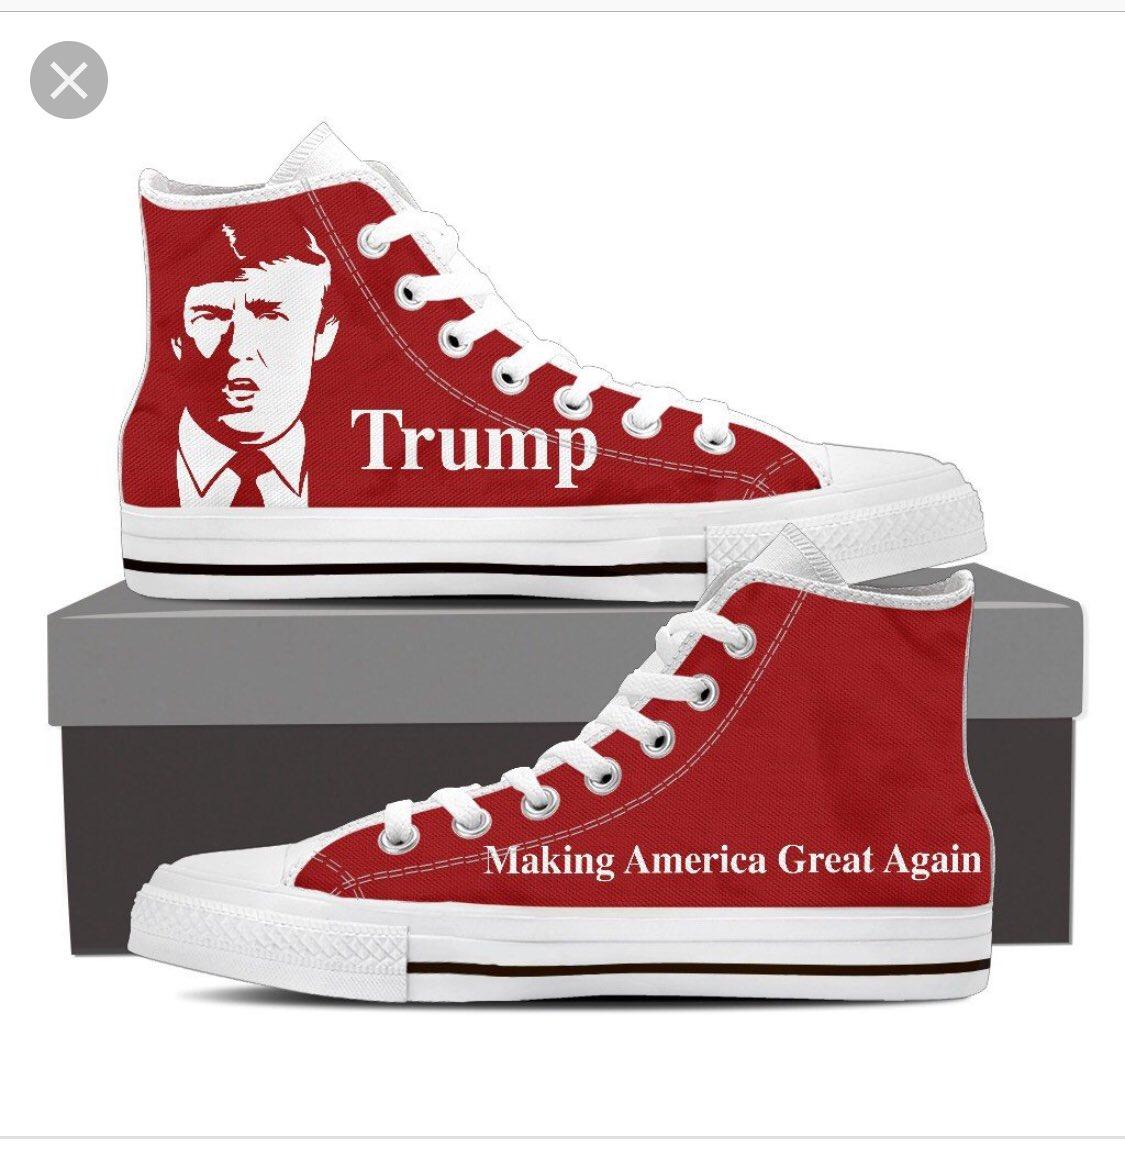 Elvis costello angels wanna wear my red shoes lyrics